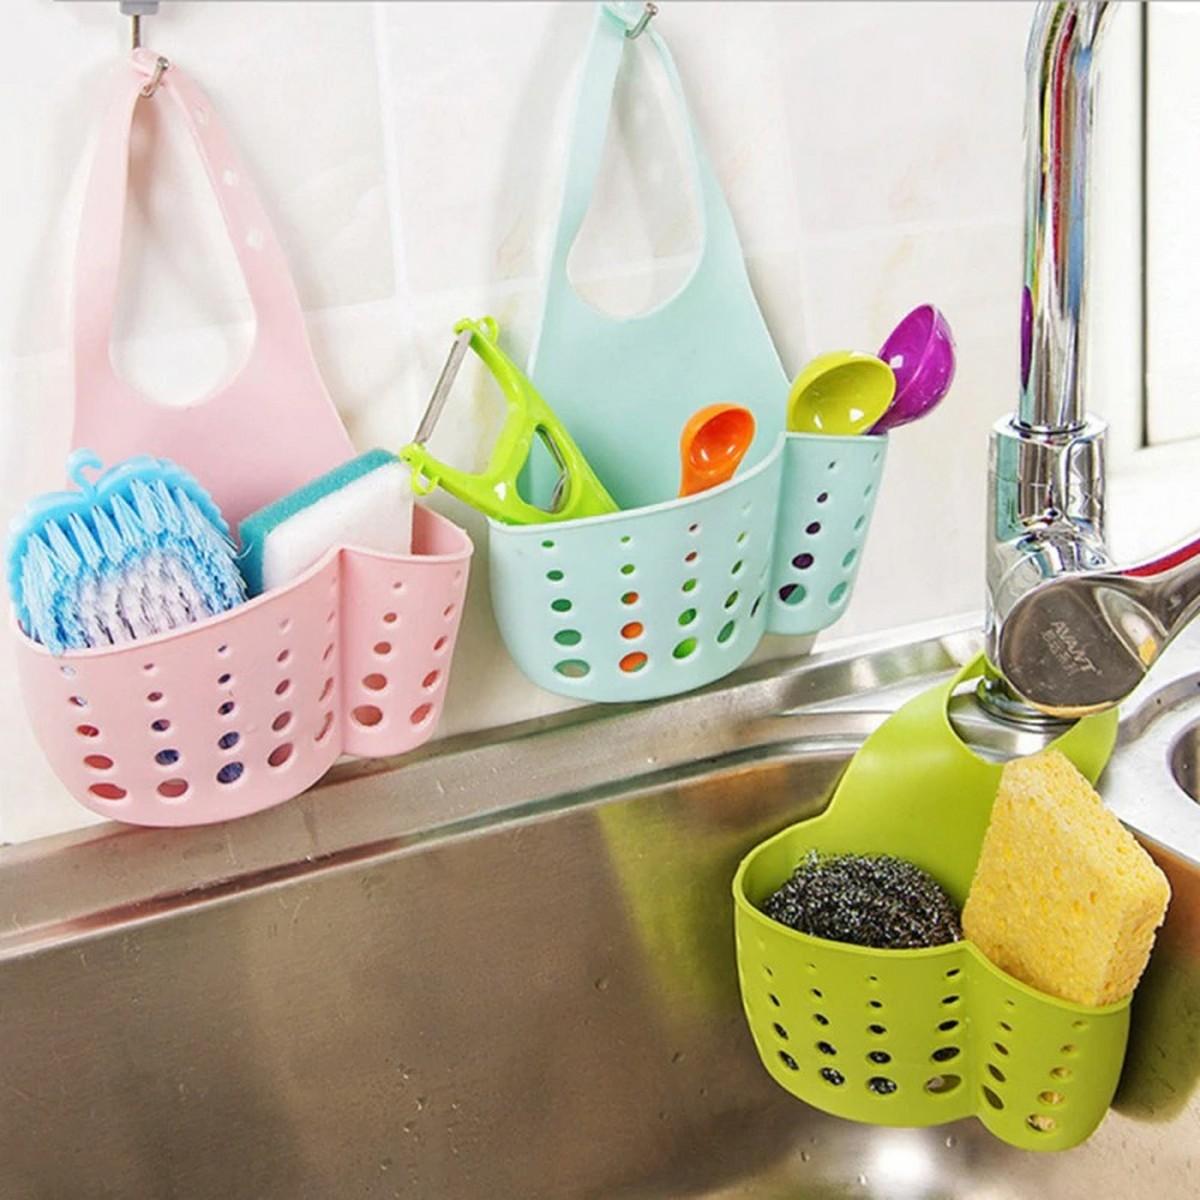 New 1pc Kitchen dishwashing cloth sponge storage bag sink soap holder portable home hanging drain bag tool storage basket